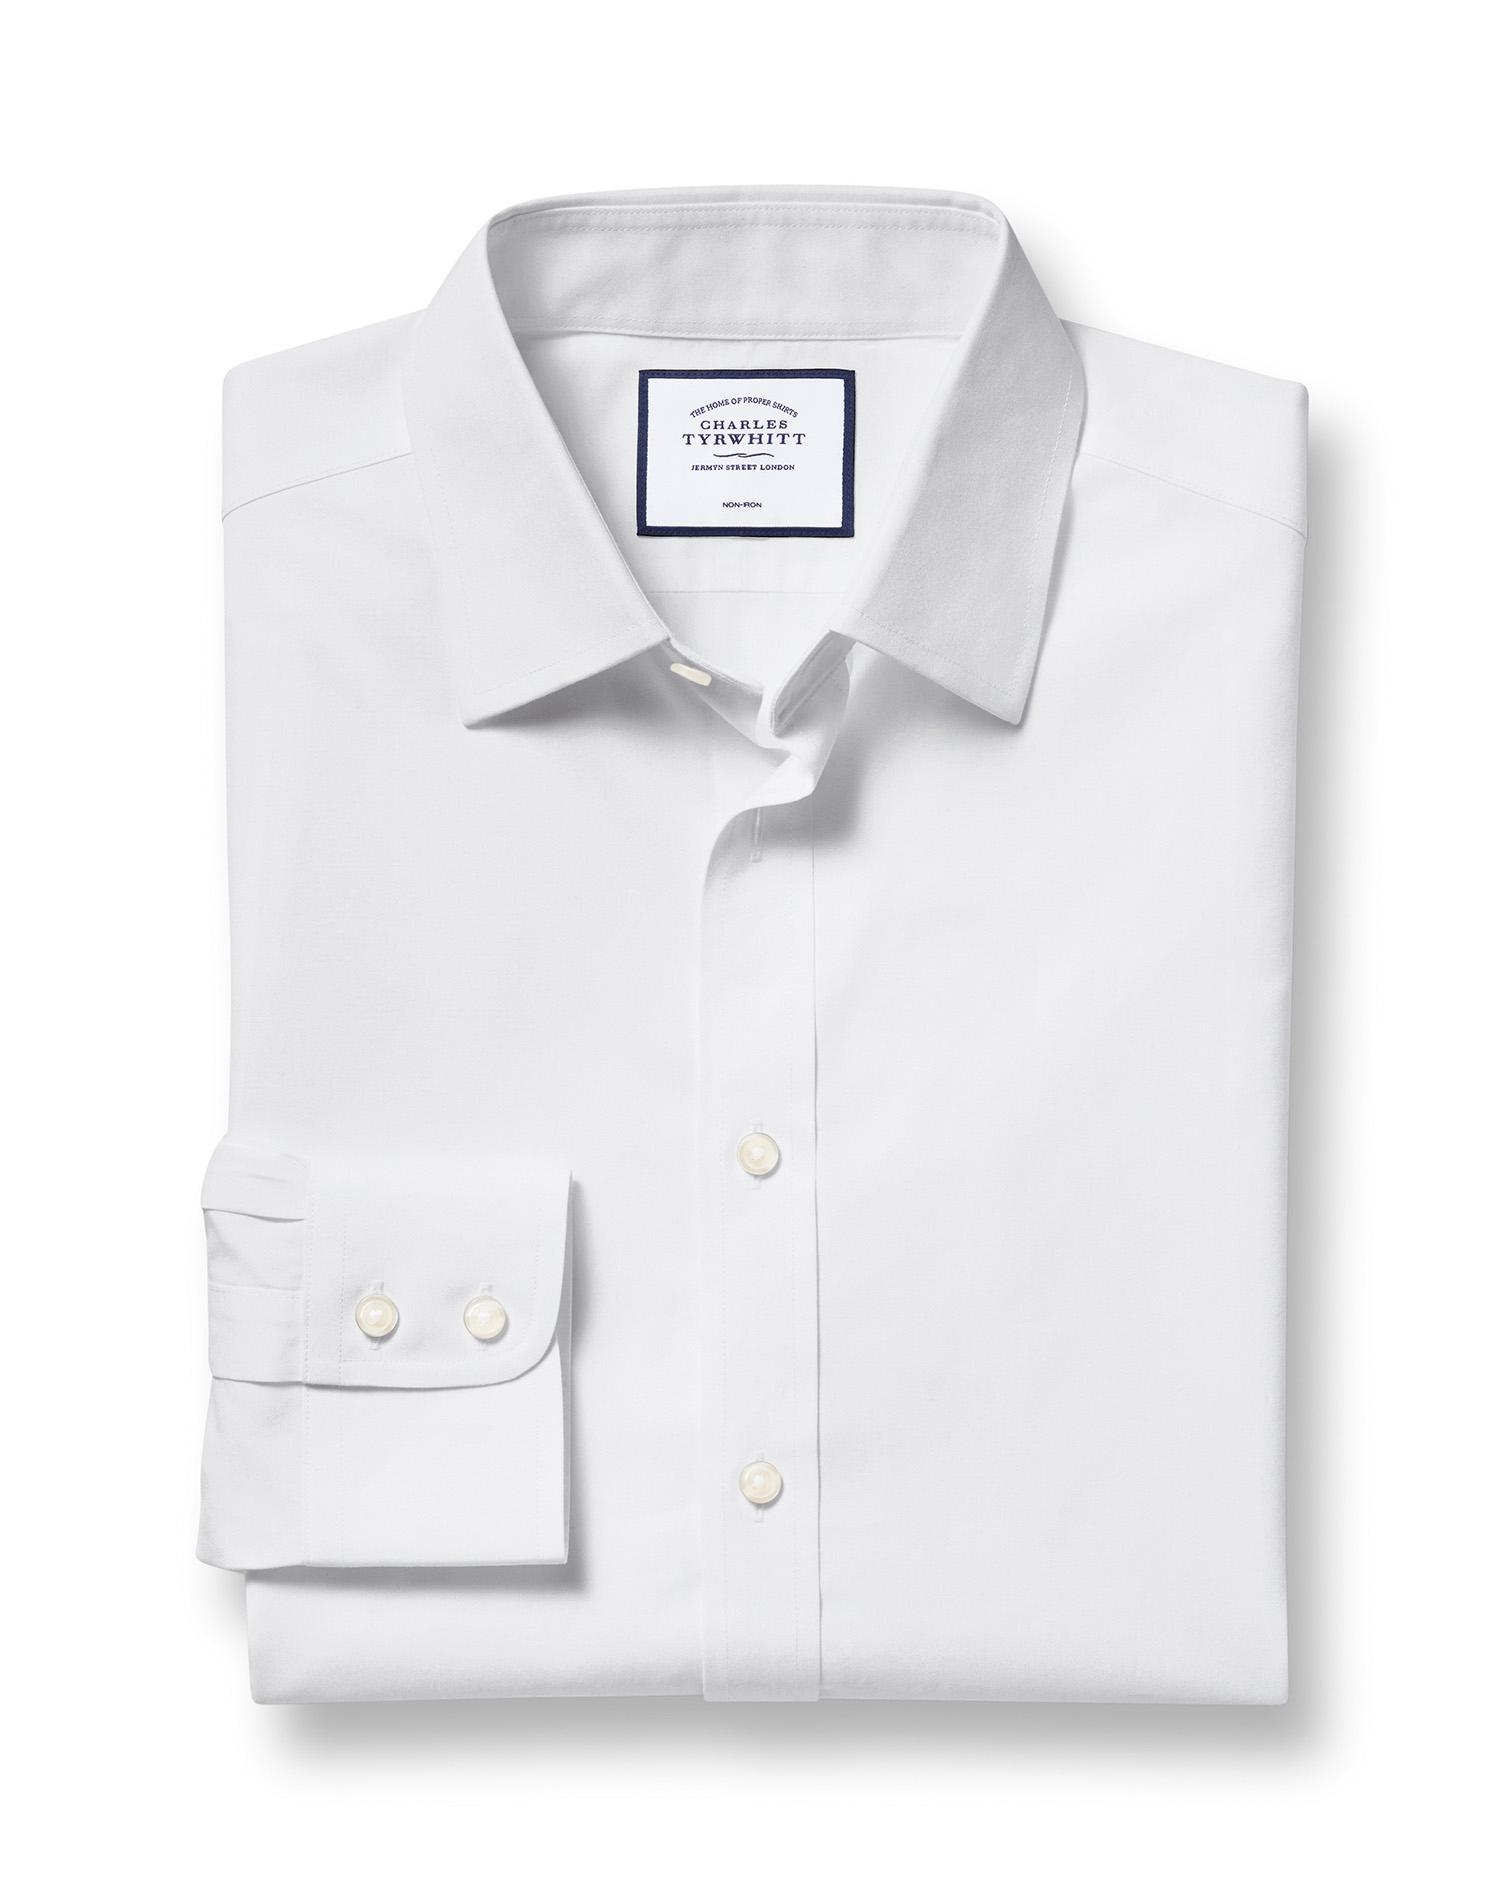 Slim Fit White Non-Iron Poplin Cotton Formal Shirt Single Cuff Size 15.5/36 by Charles Tyrwhitt